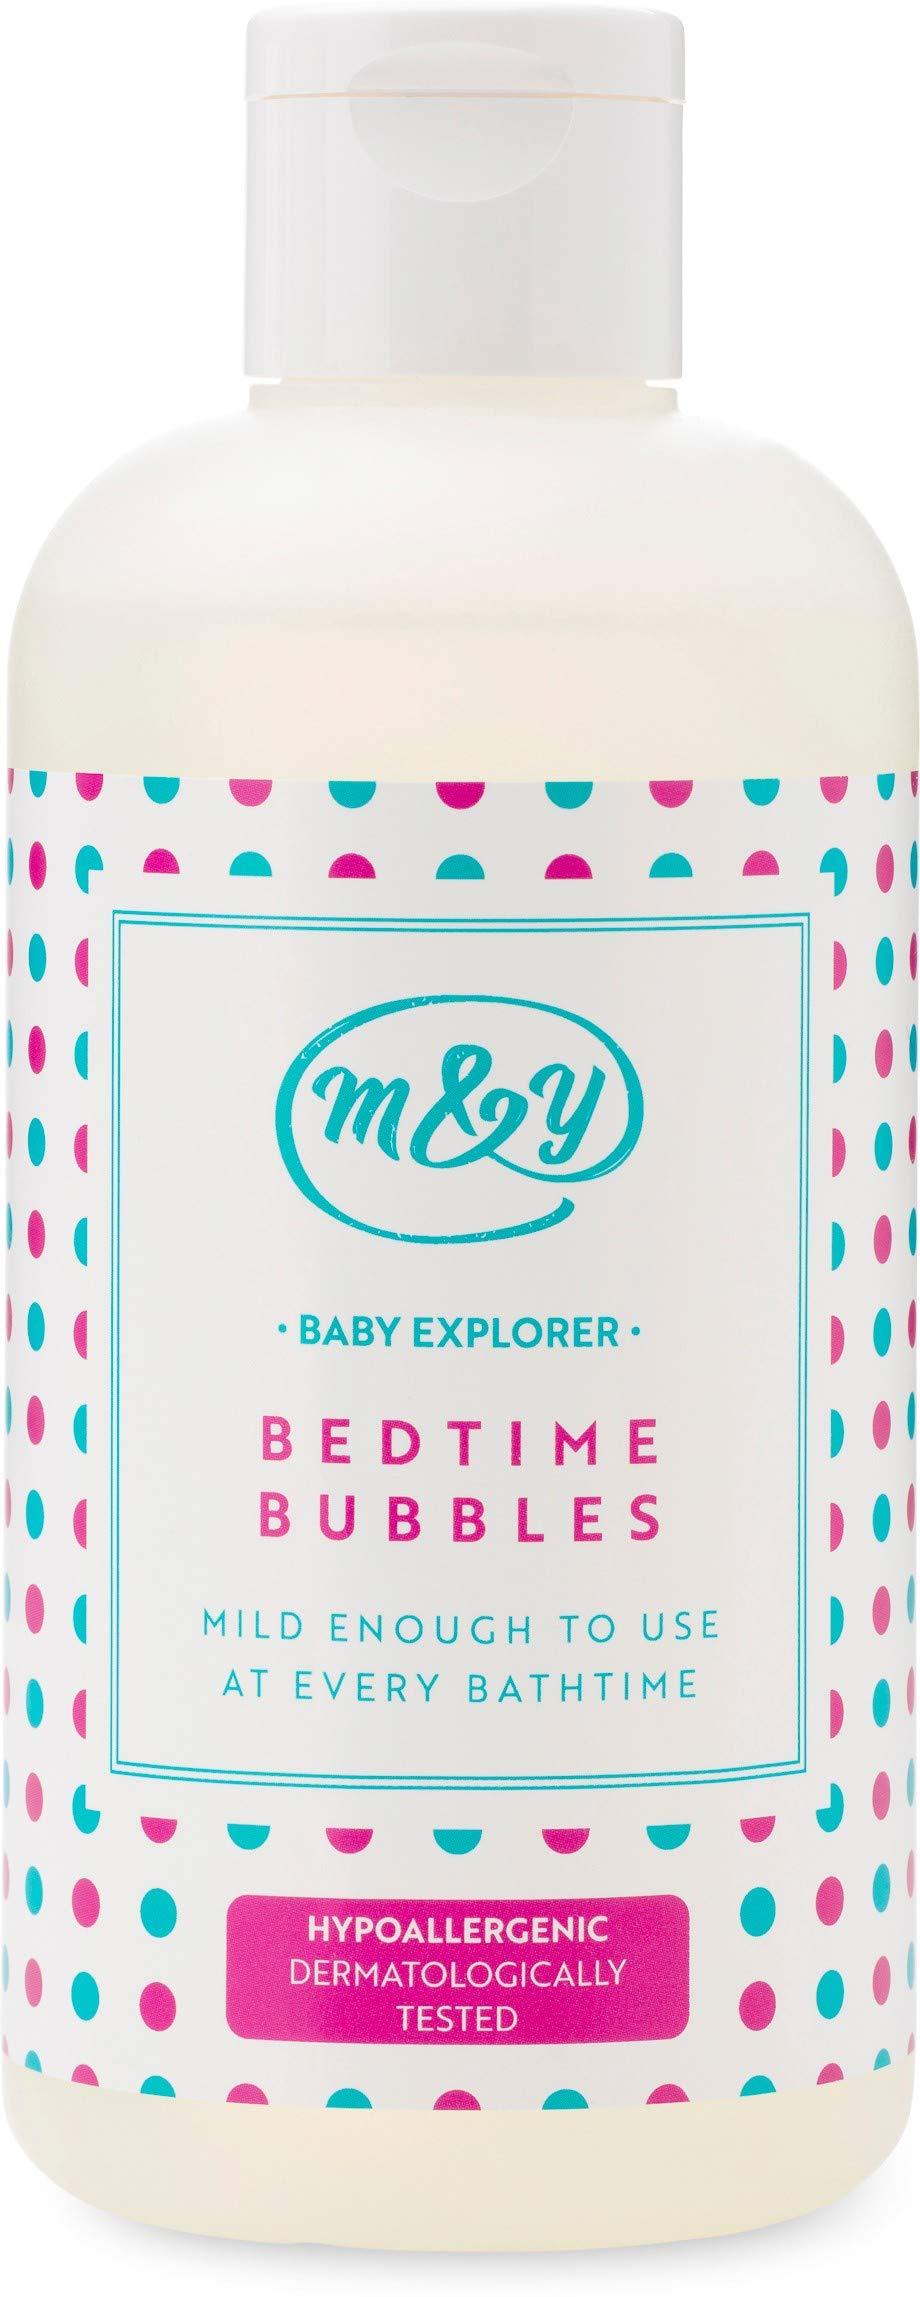 Mum & You Baby Explorer Bedtime Bubbles,1 ea (8.45 fl oz), Formulated Without Major Allergens. Hypoallergenic & Dermatologically Tested. Light Bedtime Fragrance. Suitable for Sensitive Skin